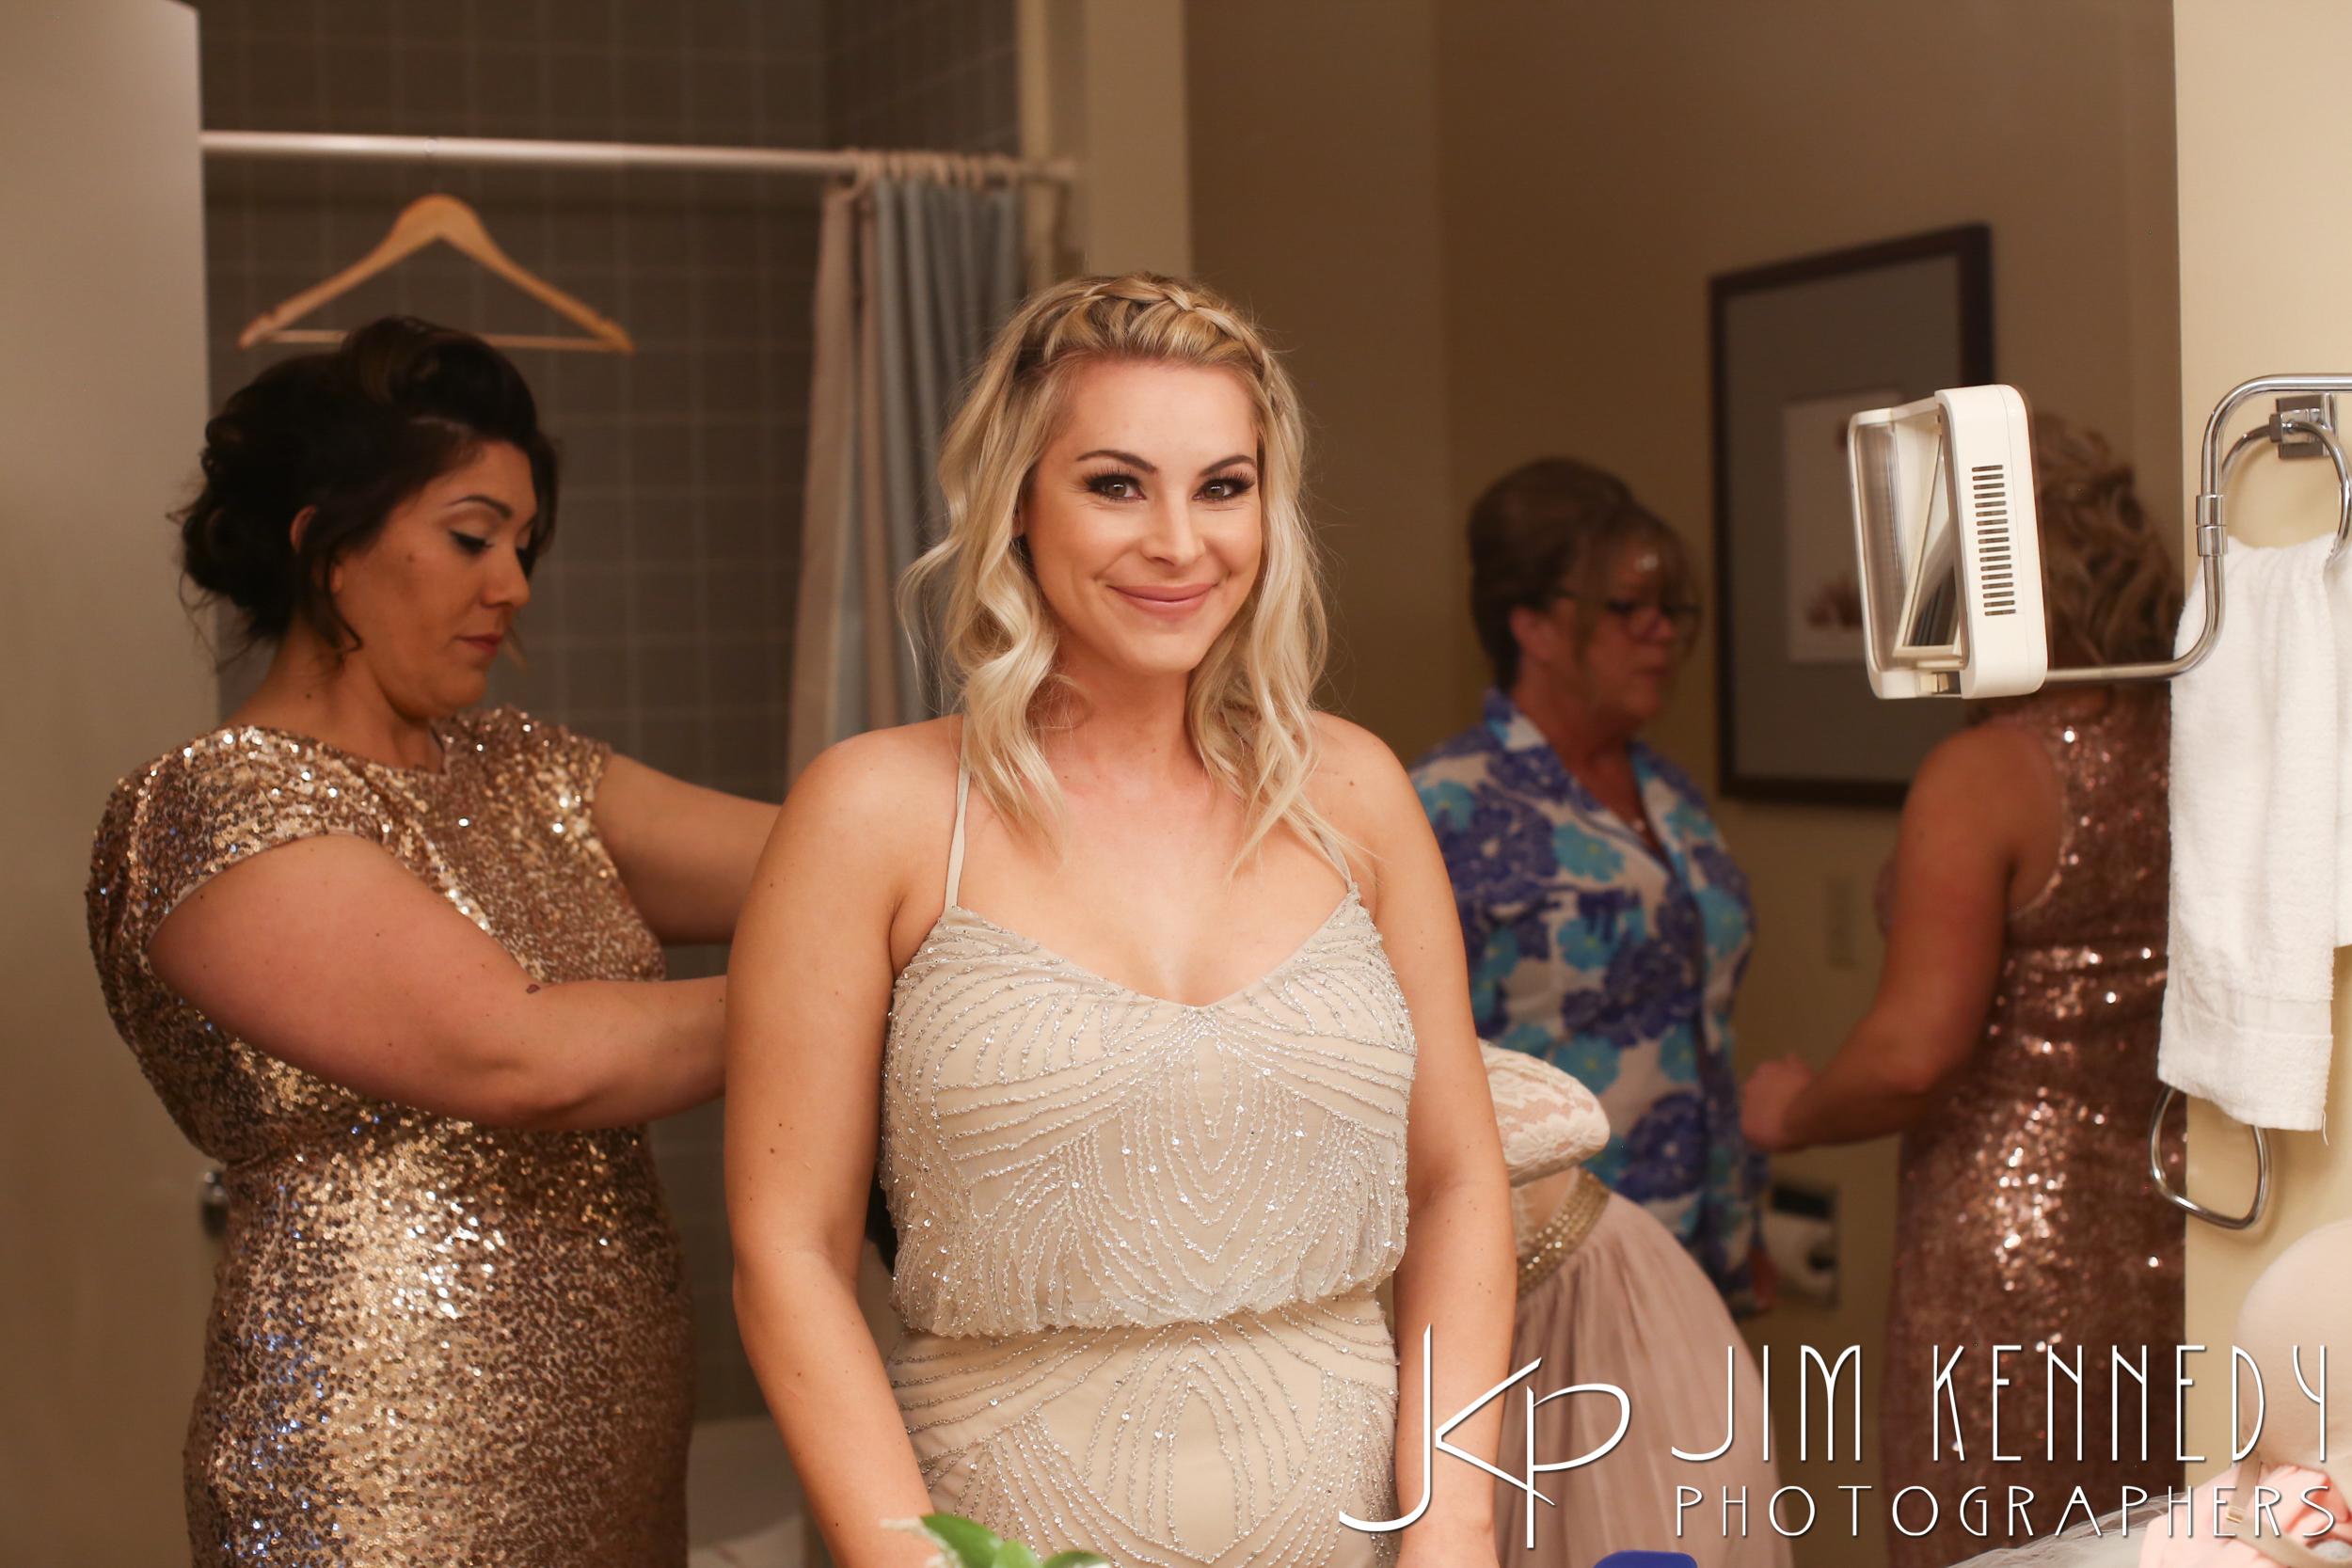 jim_kennedy_photographers_highland_springs_wedding_caitlyn_0020.jpg